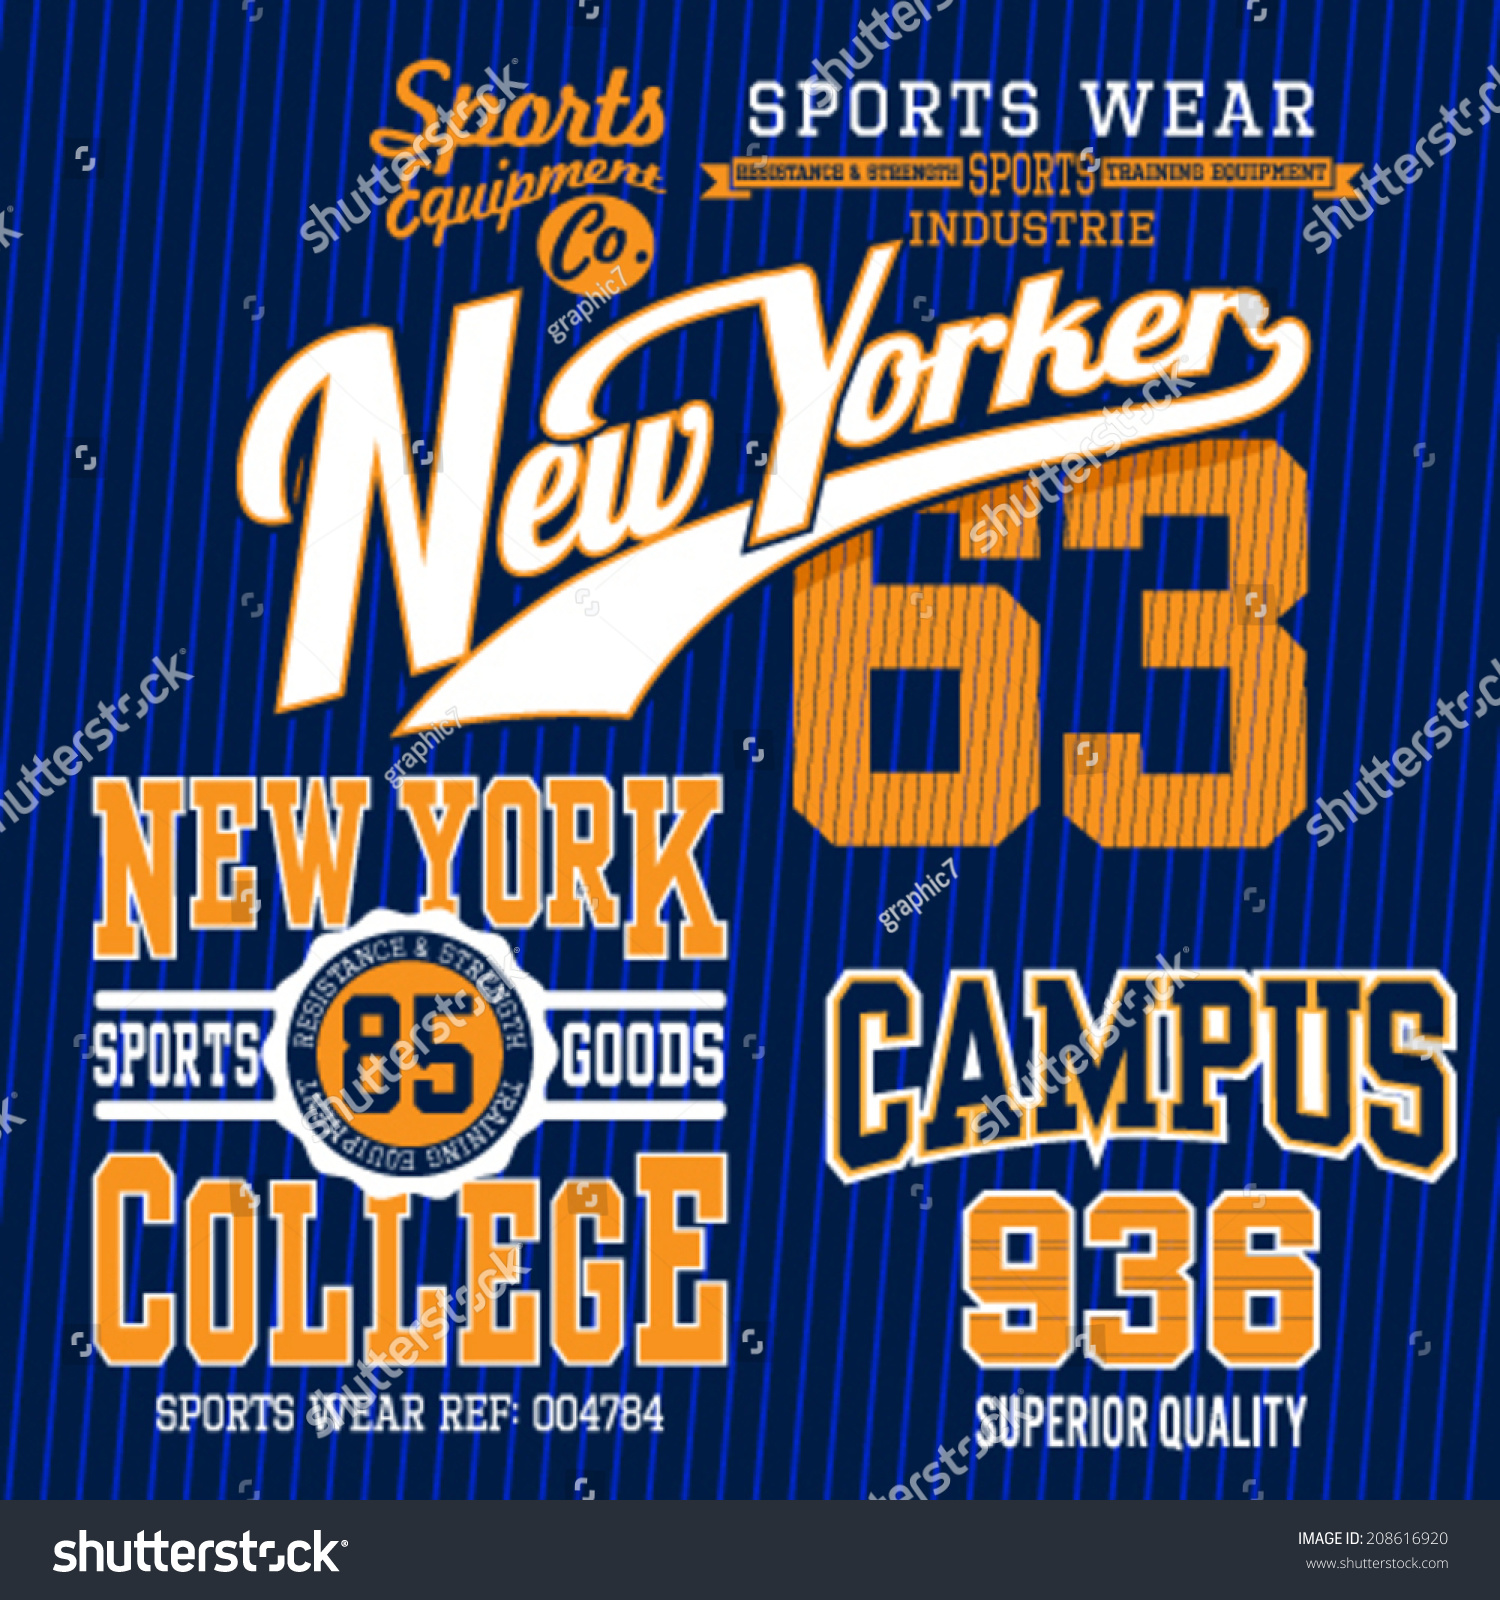 Shirt design vector pack - Set Of Sporty Looking T Shirt Design Vector Version